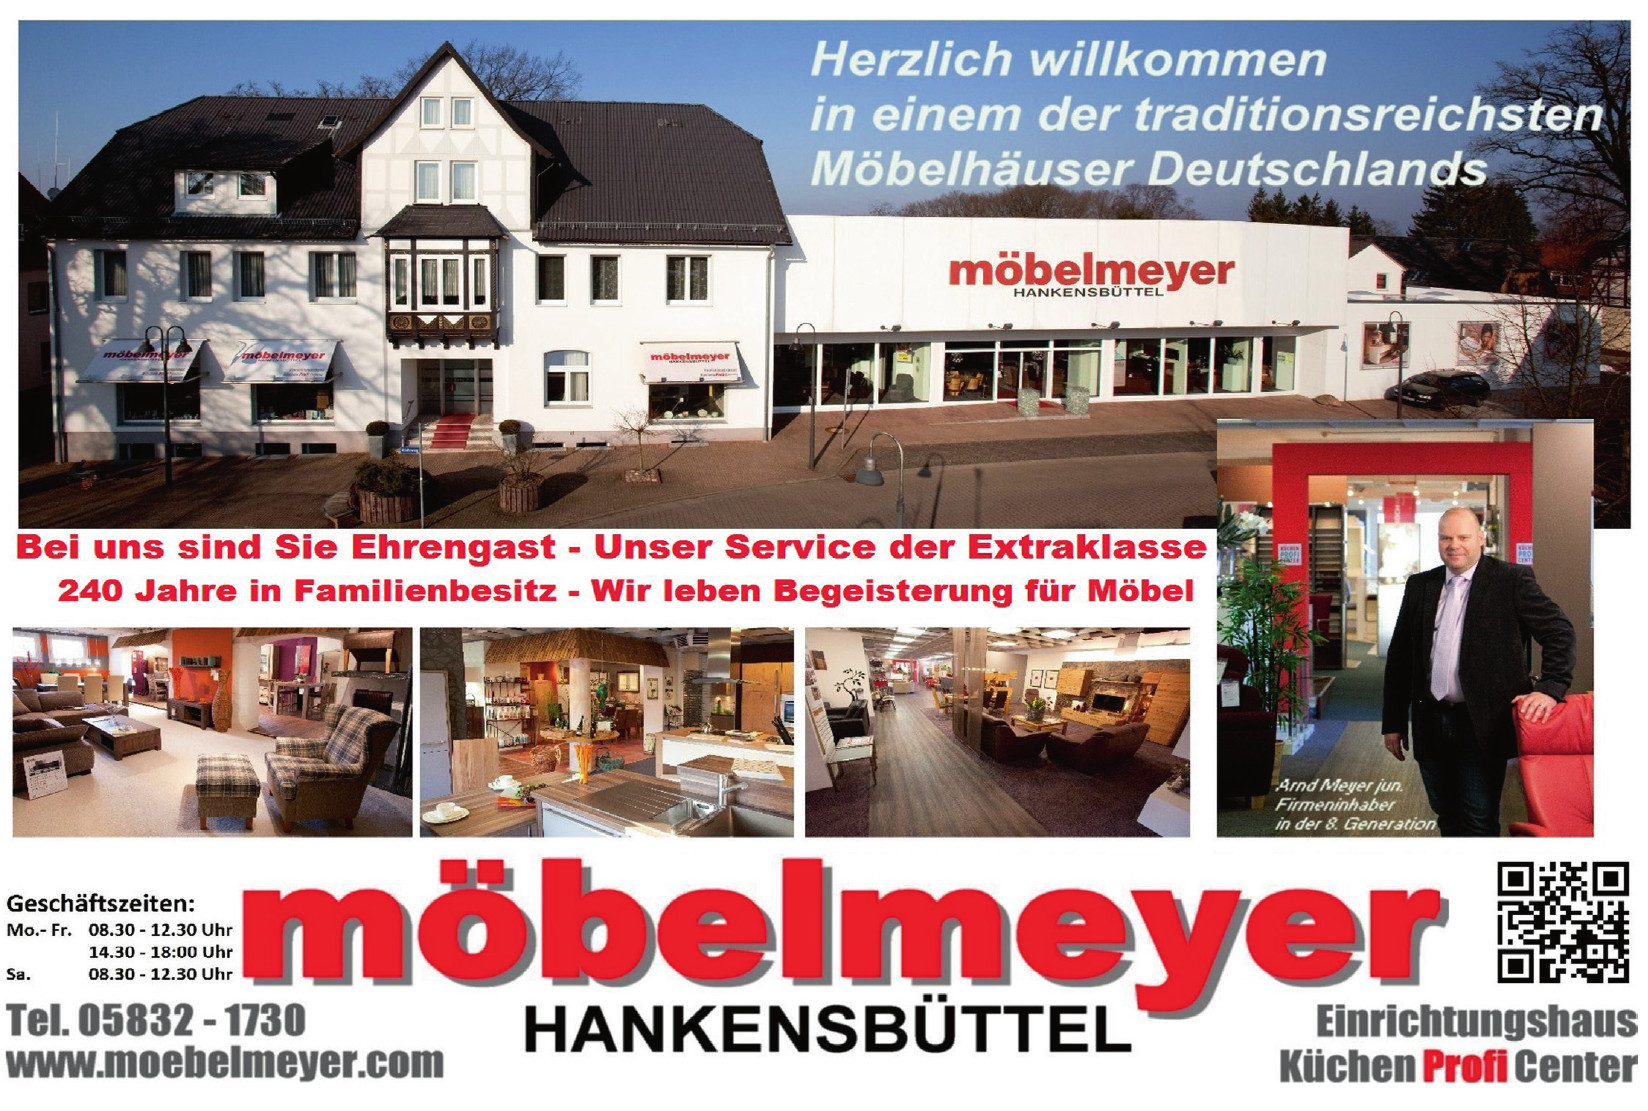 Möbelmeyer Hankensbüttel